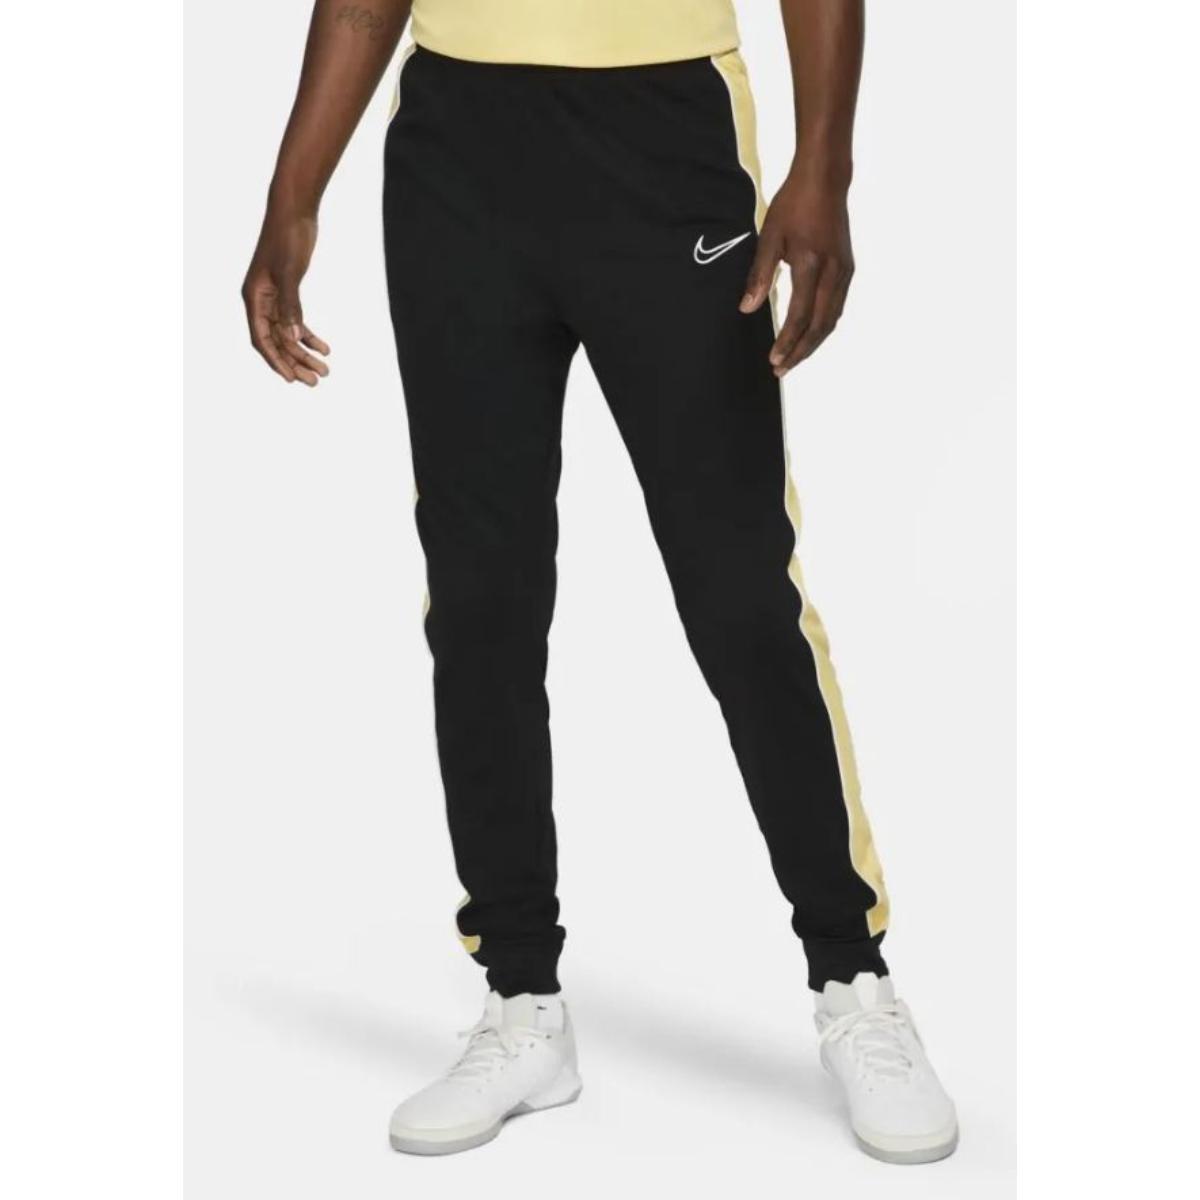 Calça Masculina Nike Cz0971-011 Dri-fit Academy Preto/amarelo